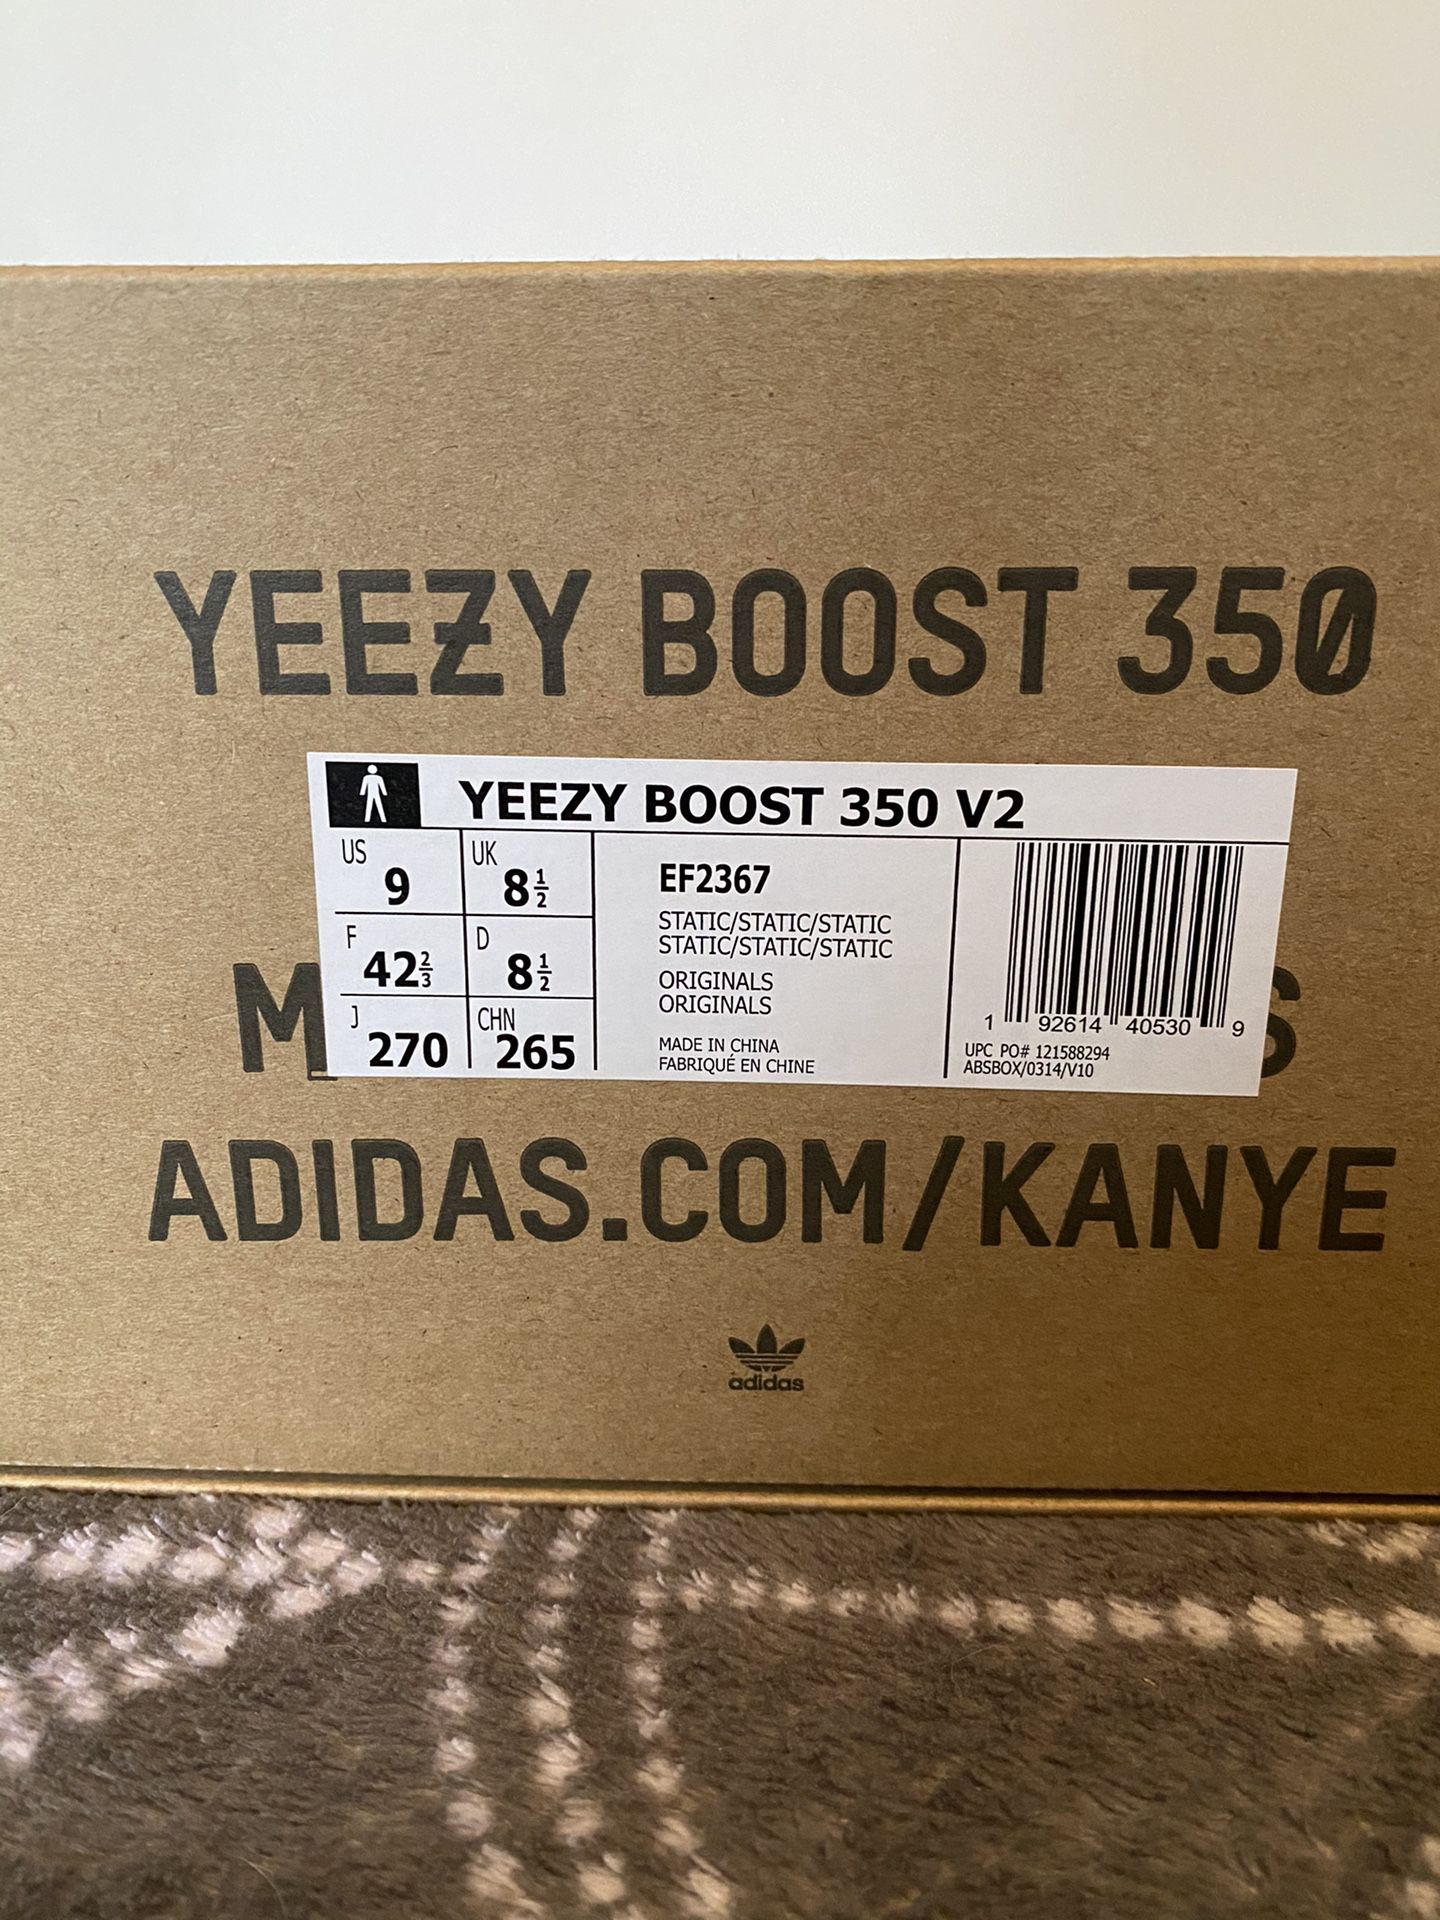 Yeezy boost 350 v2 static reflective